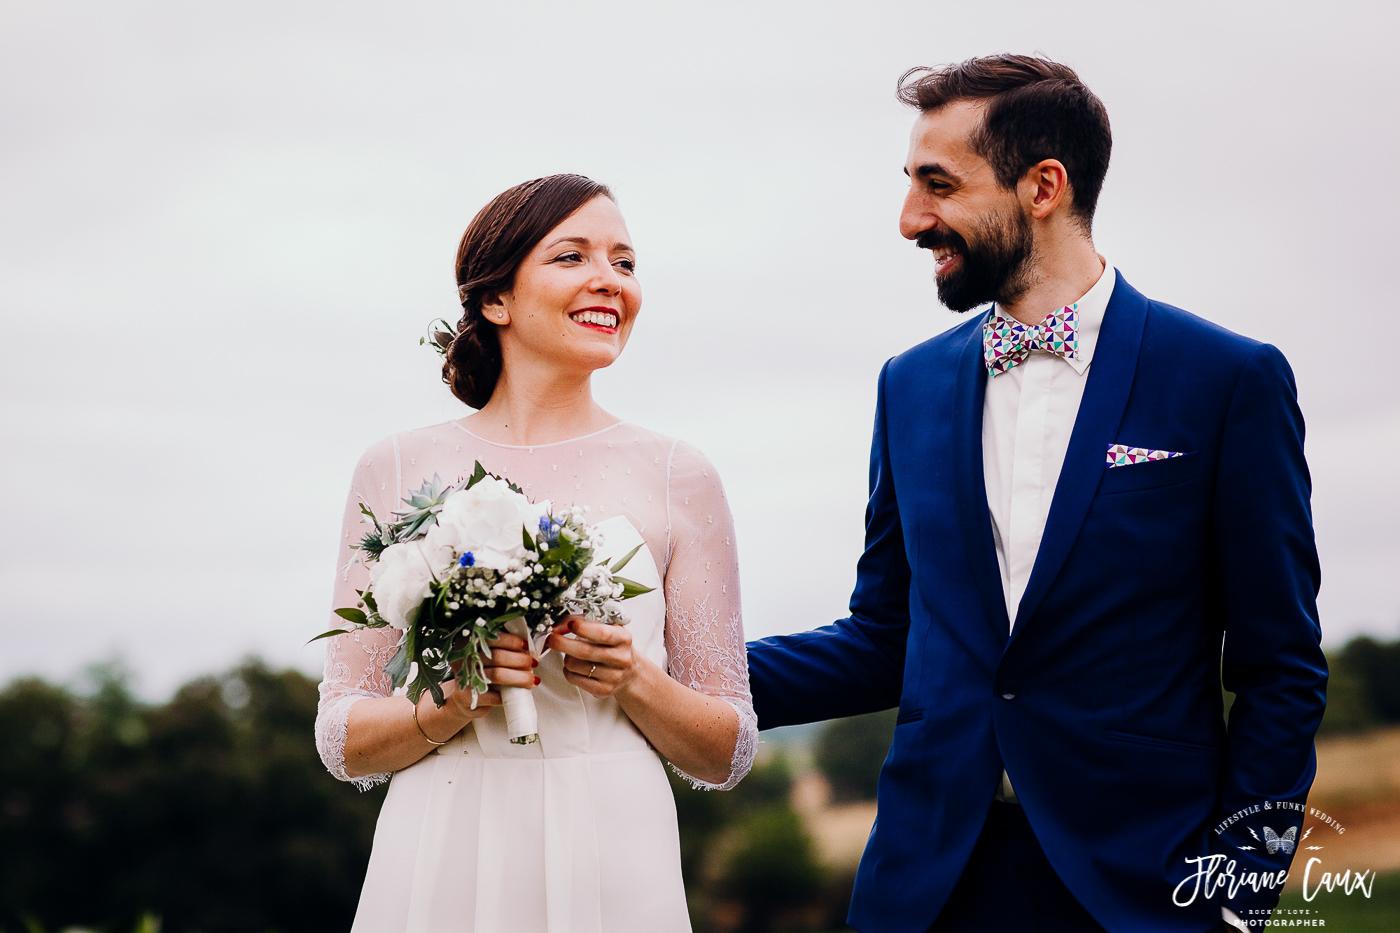 photographe-mariage-pays-basque-Floriane-Caux (26b)